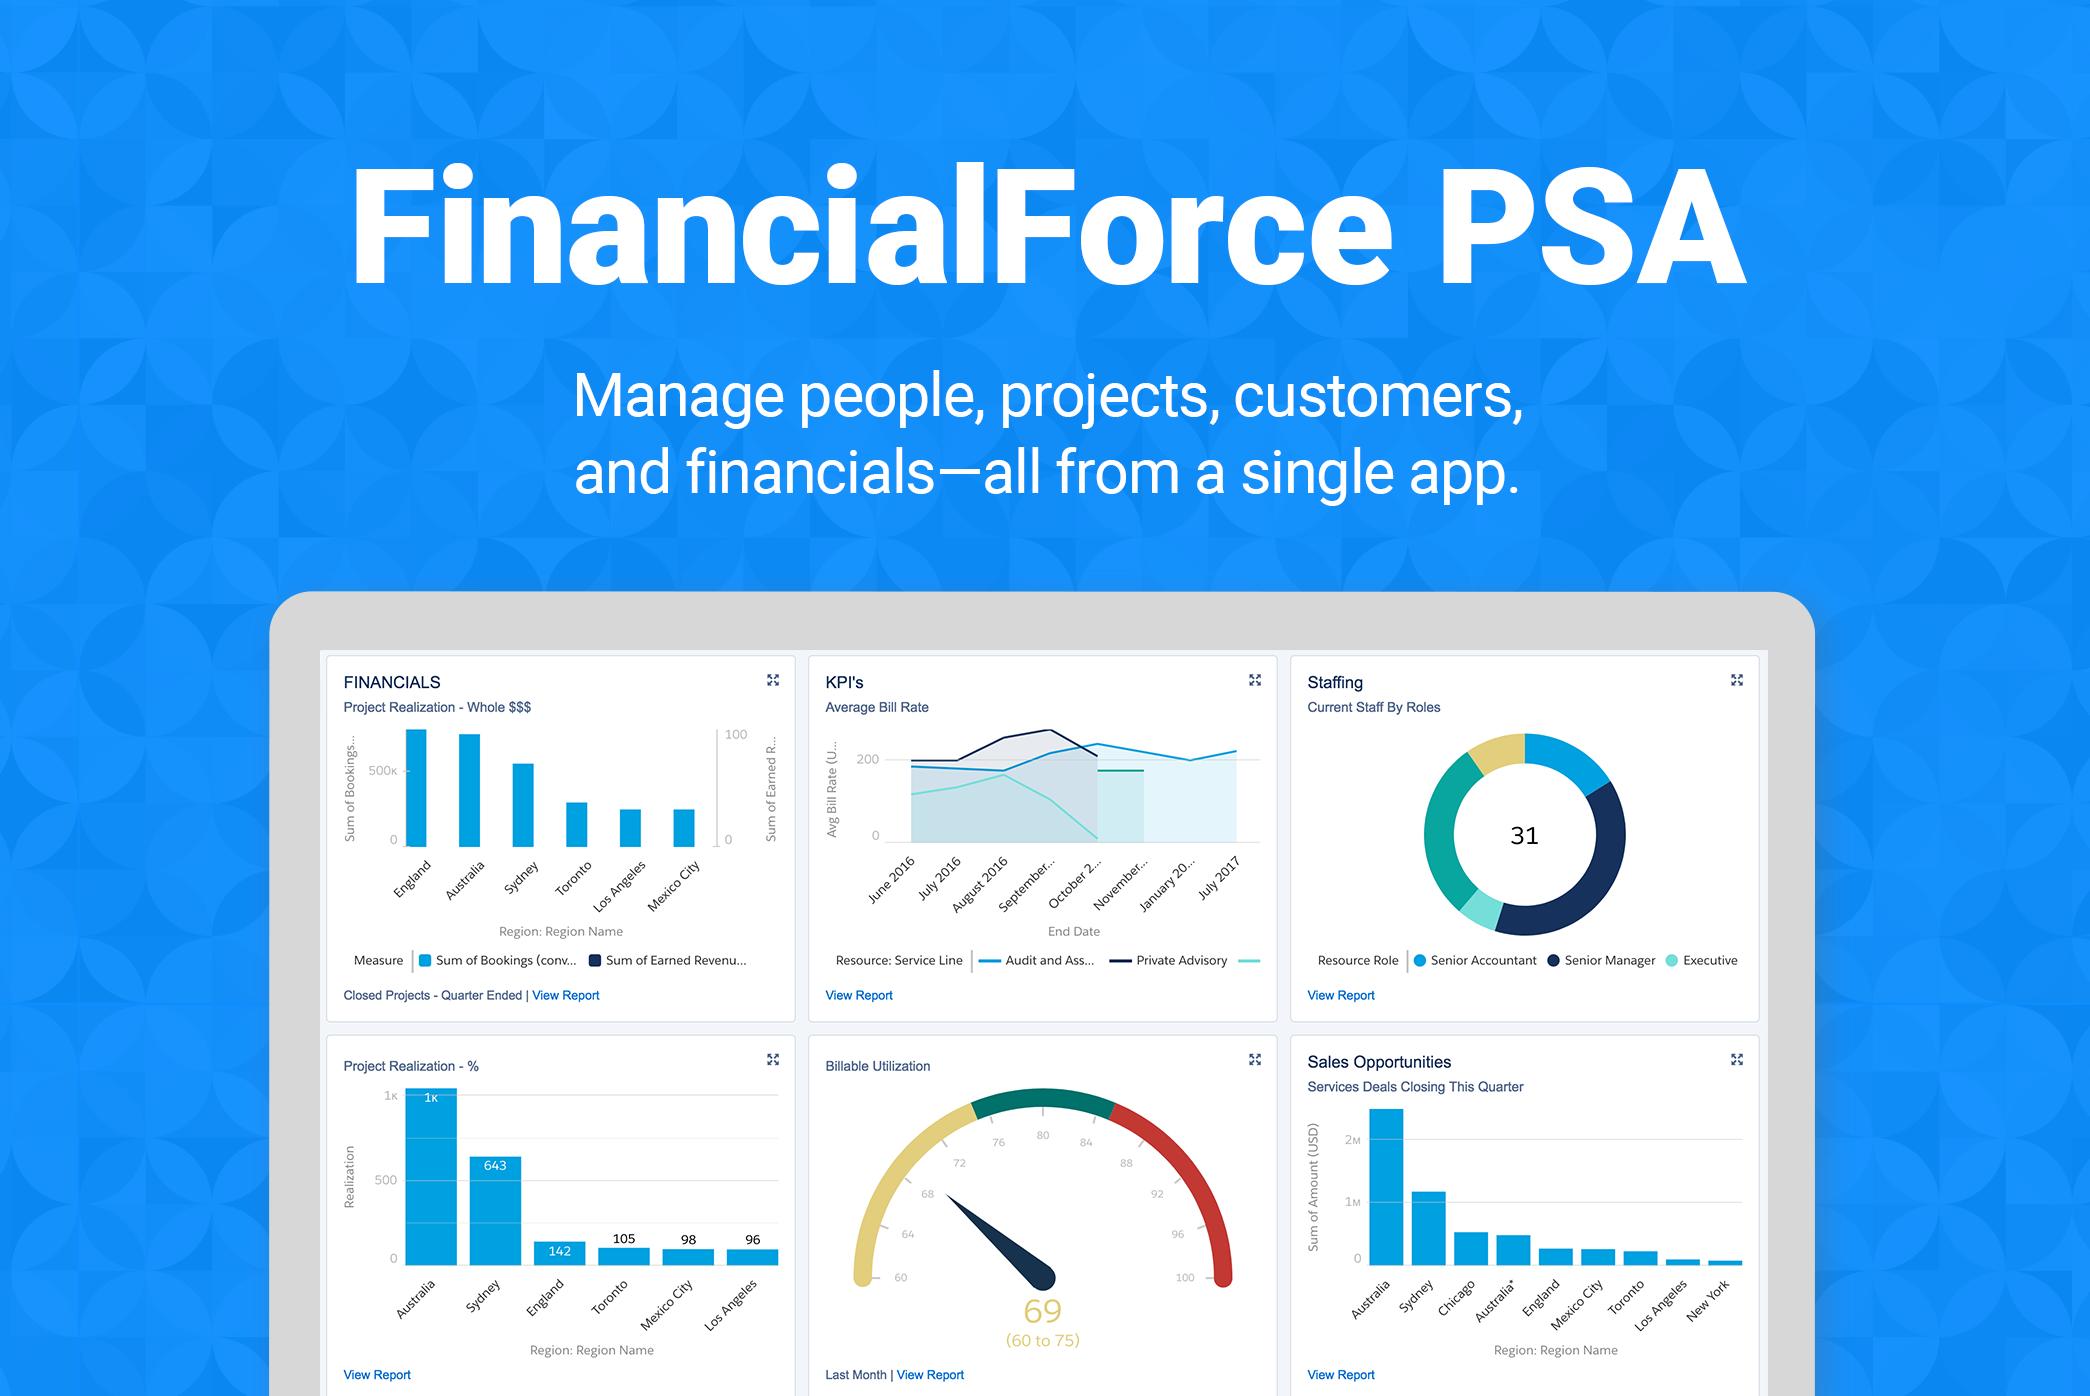 The leading PSA solution on the Salesforce Platform